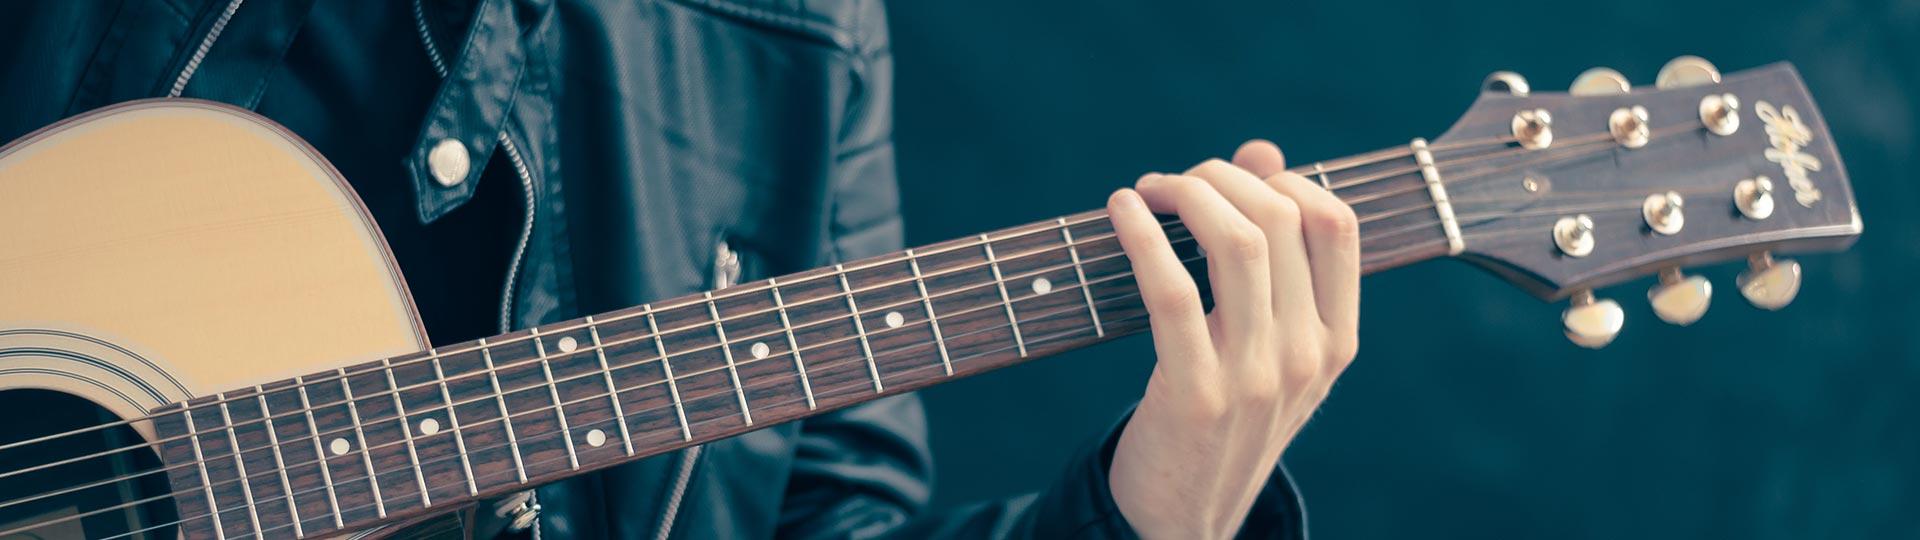 Sida Guitar Gitarr Akustisk Acoustic Amptown Studio Helsingborg